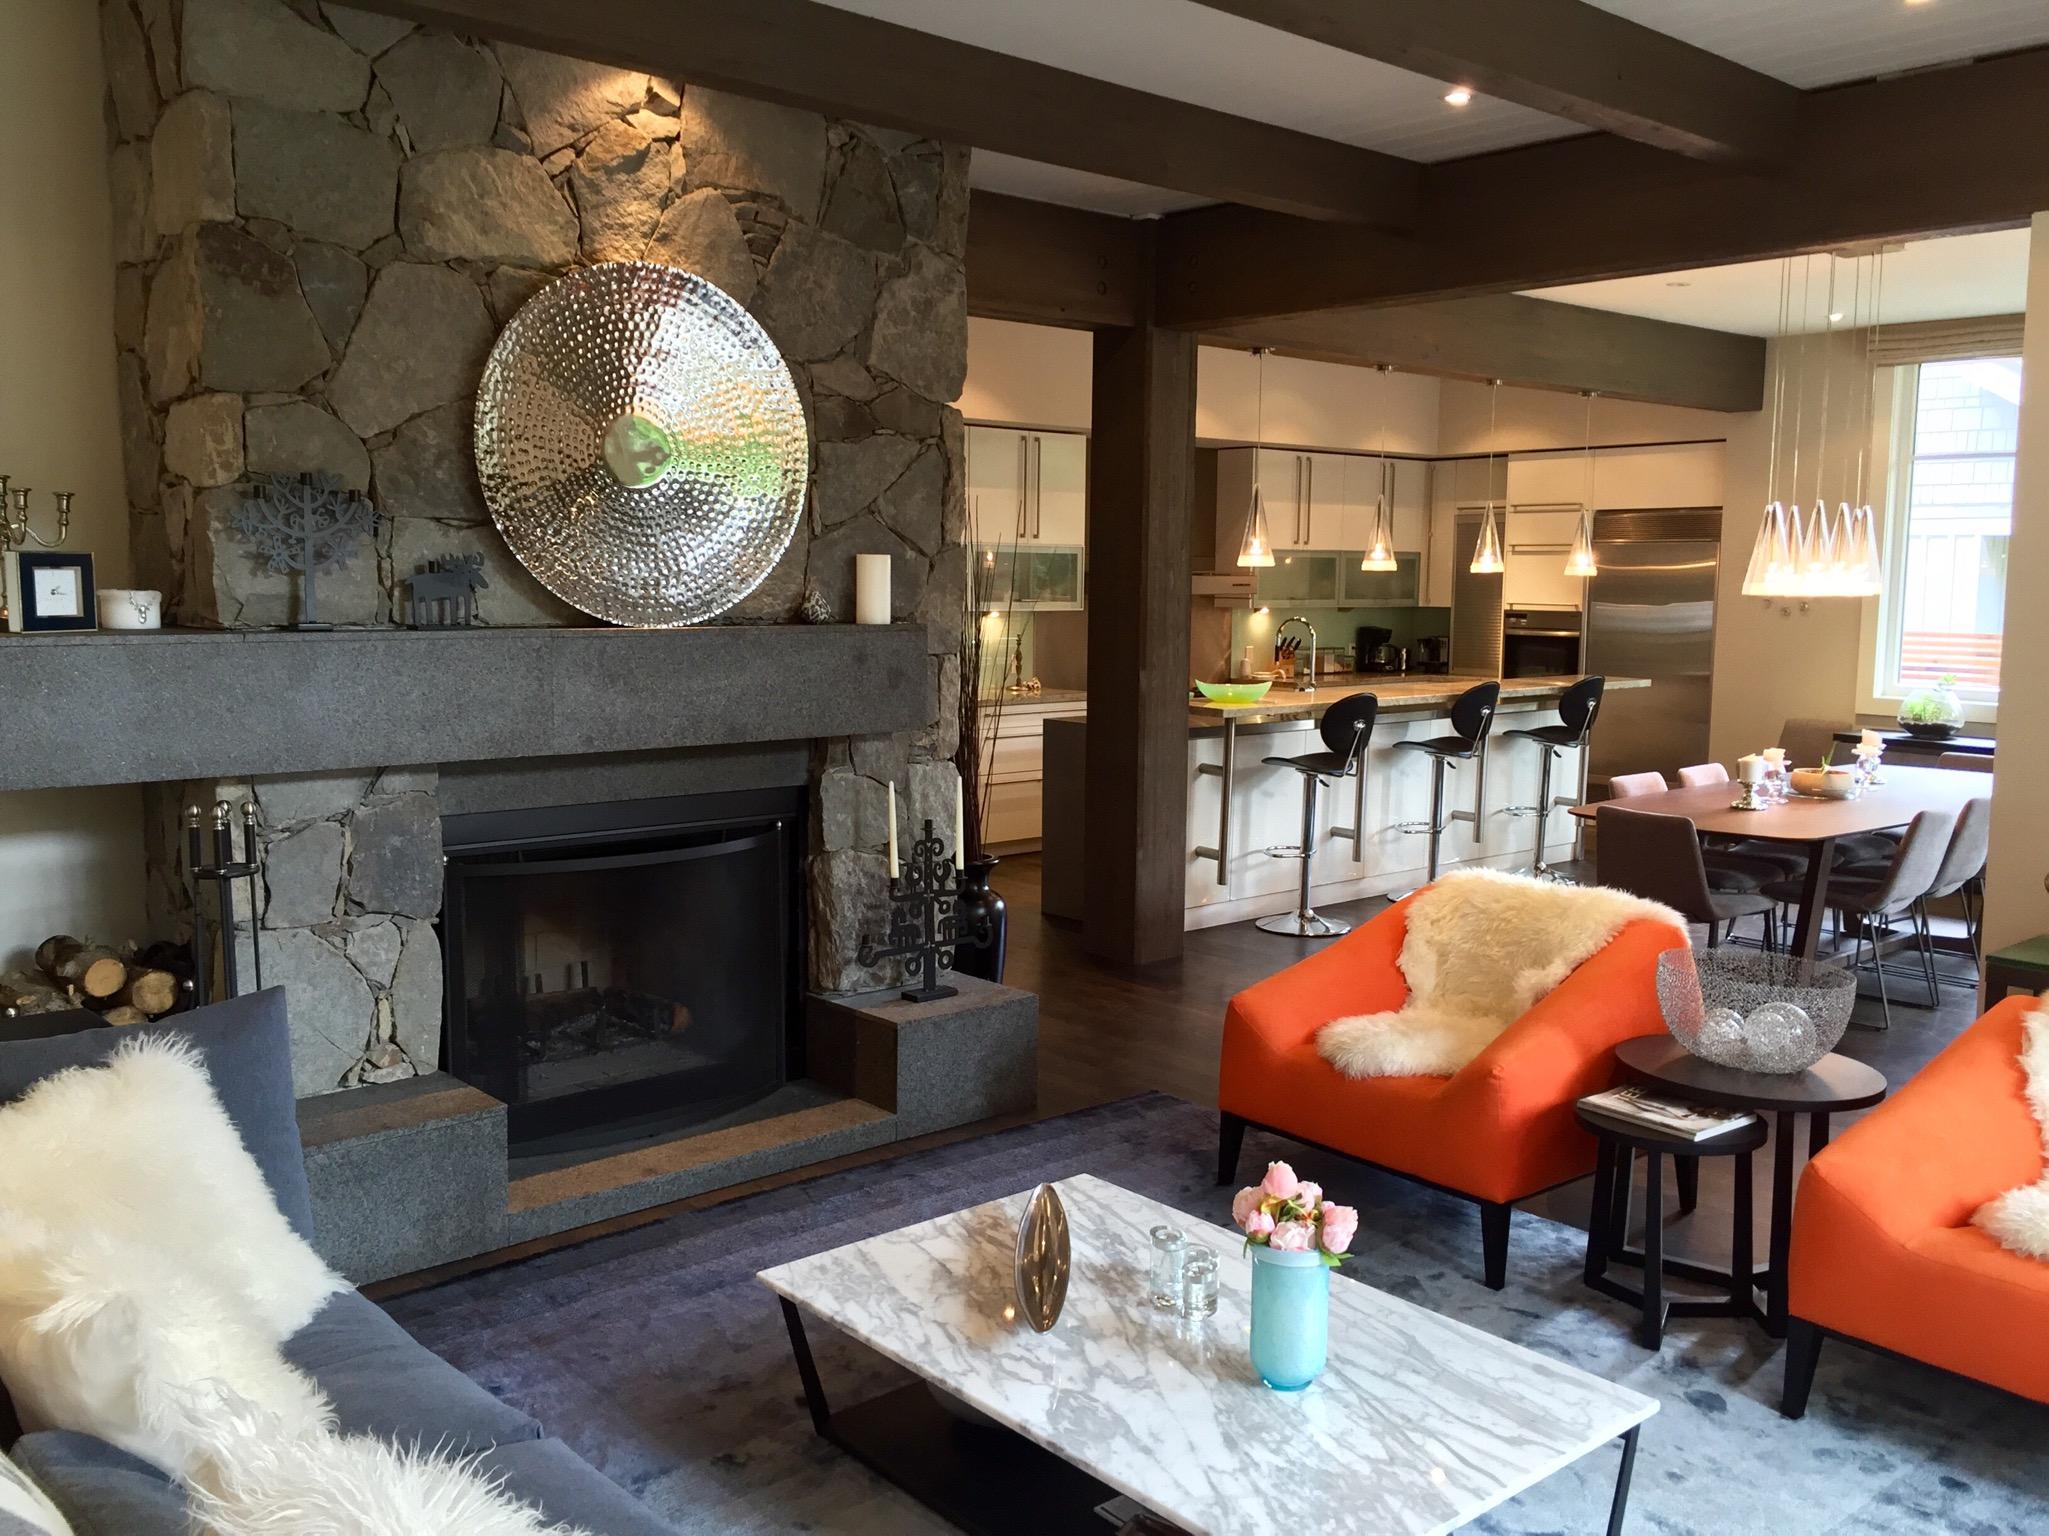 5 bedroom nicklaus north rental home whistler luxury home rentals